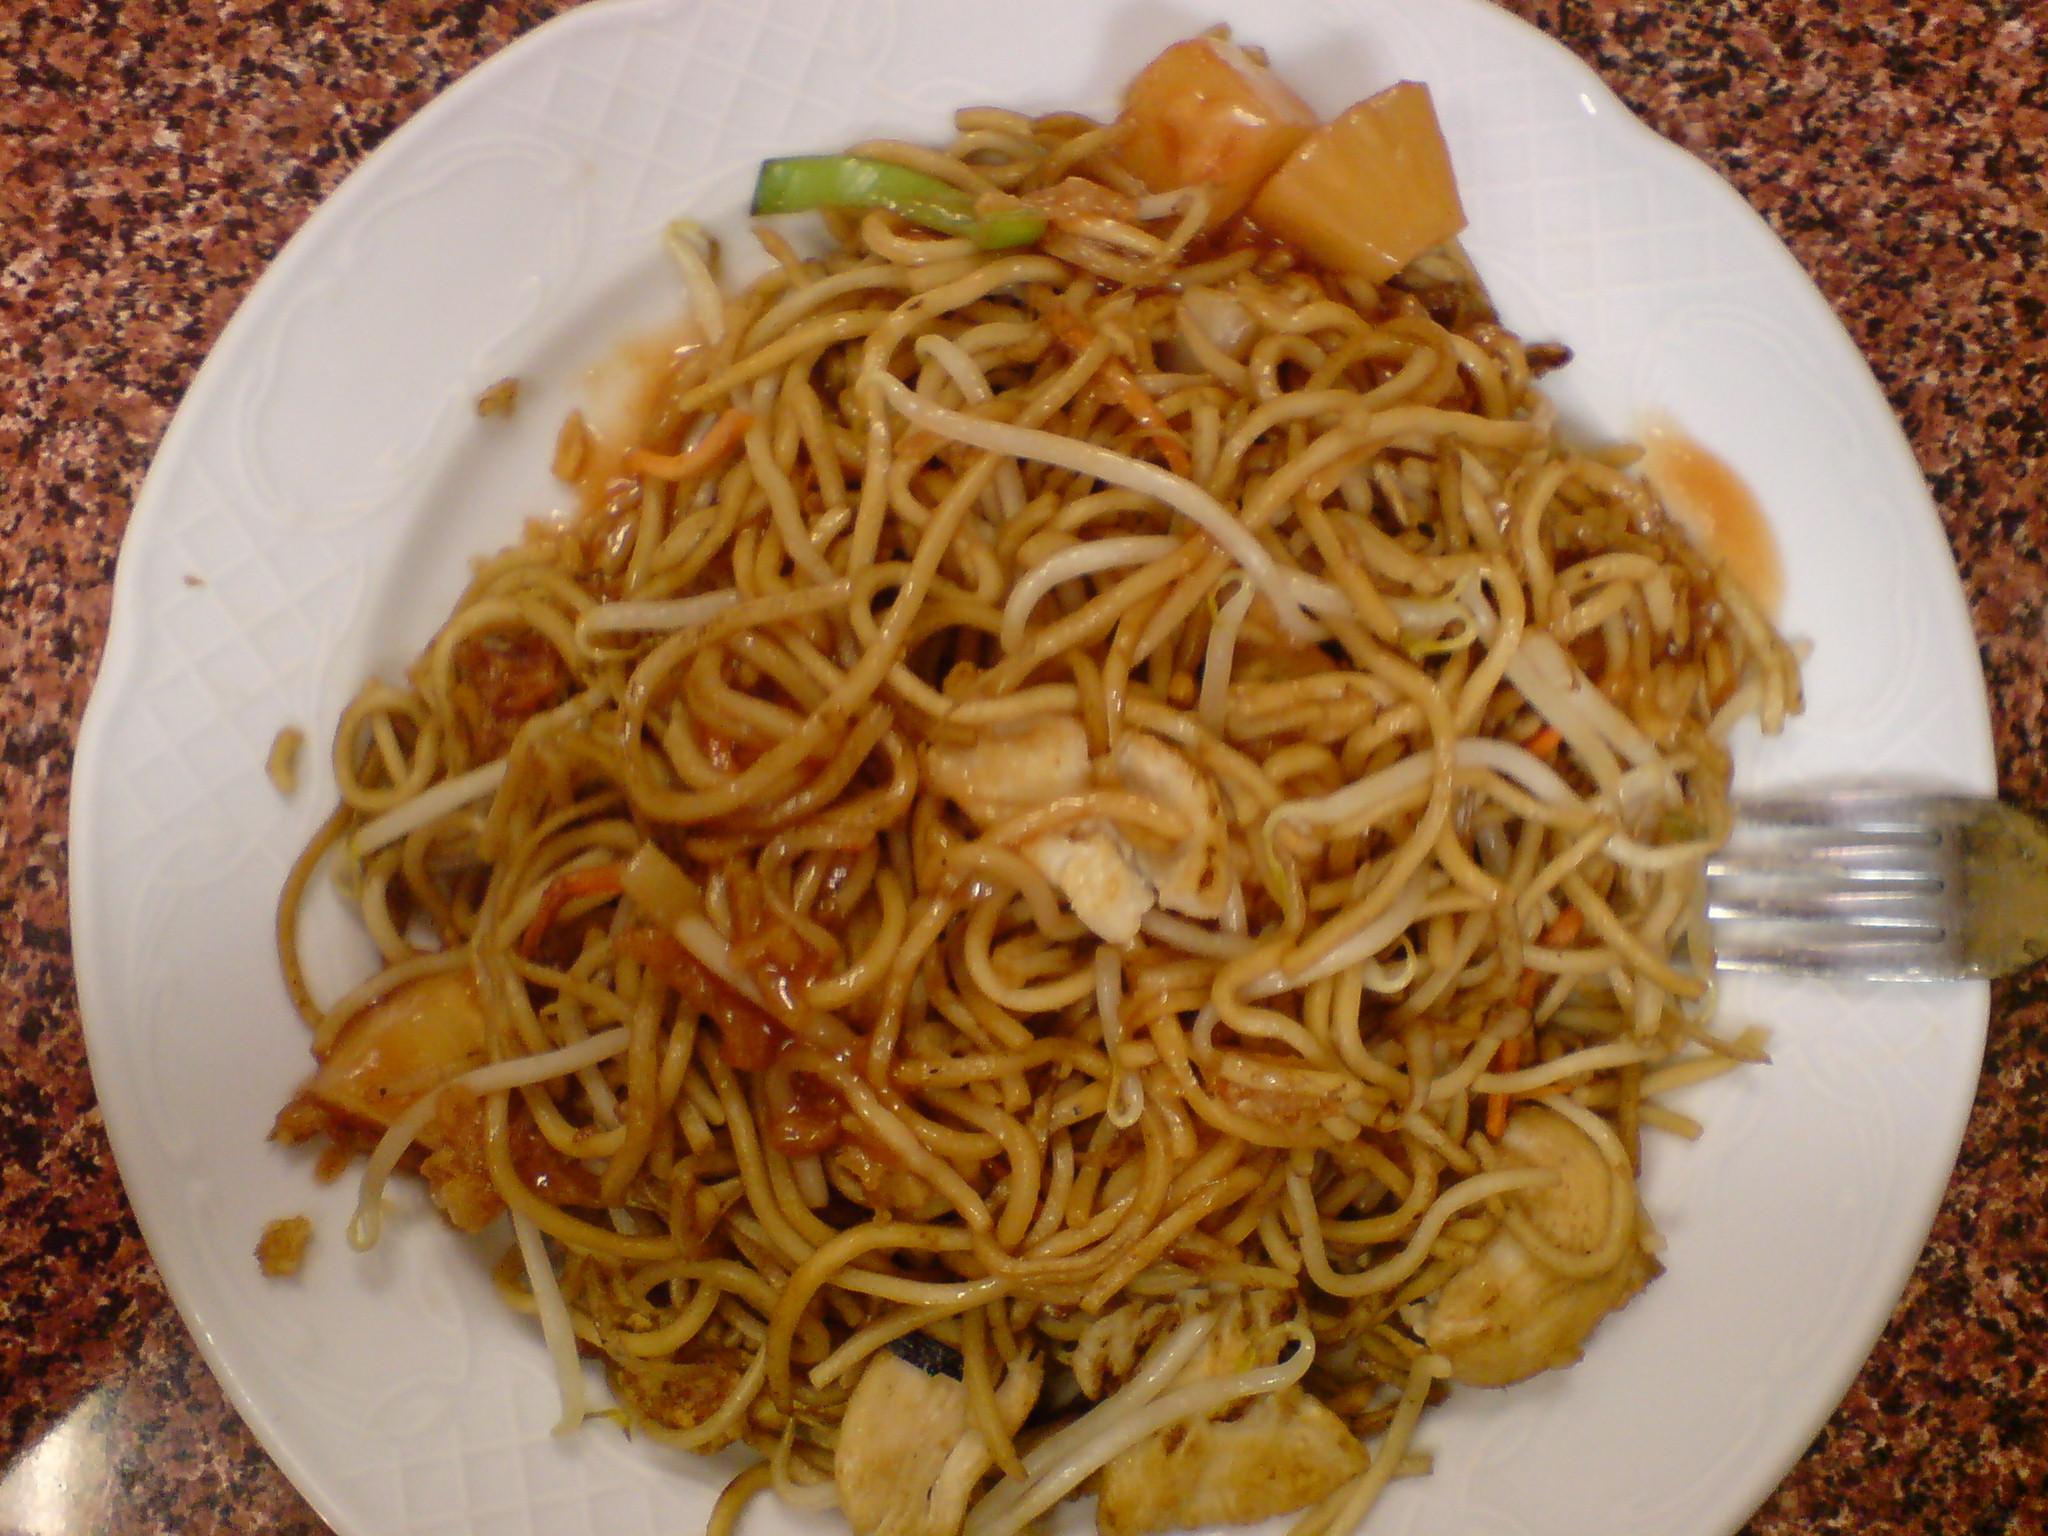 http://foodloader.net/FuN_GaM3r_2010-07-07_Asianudeln.jpg